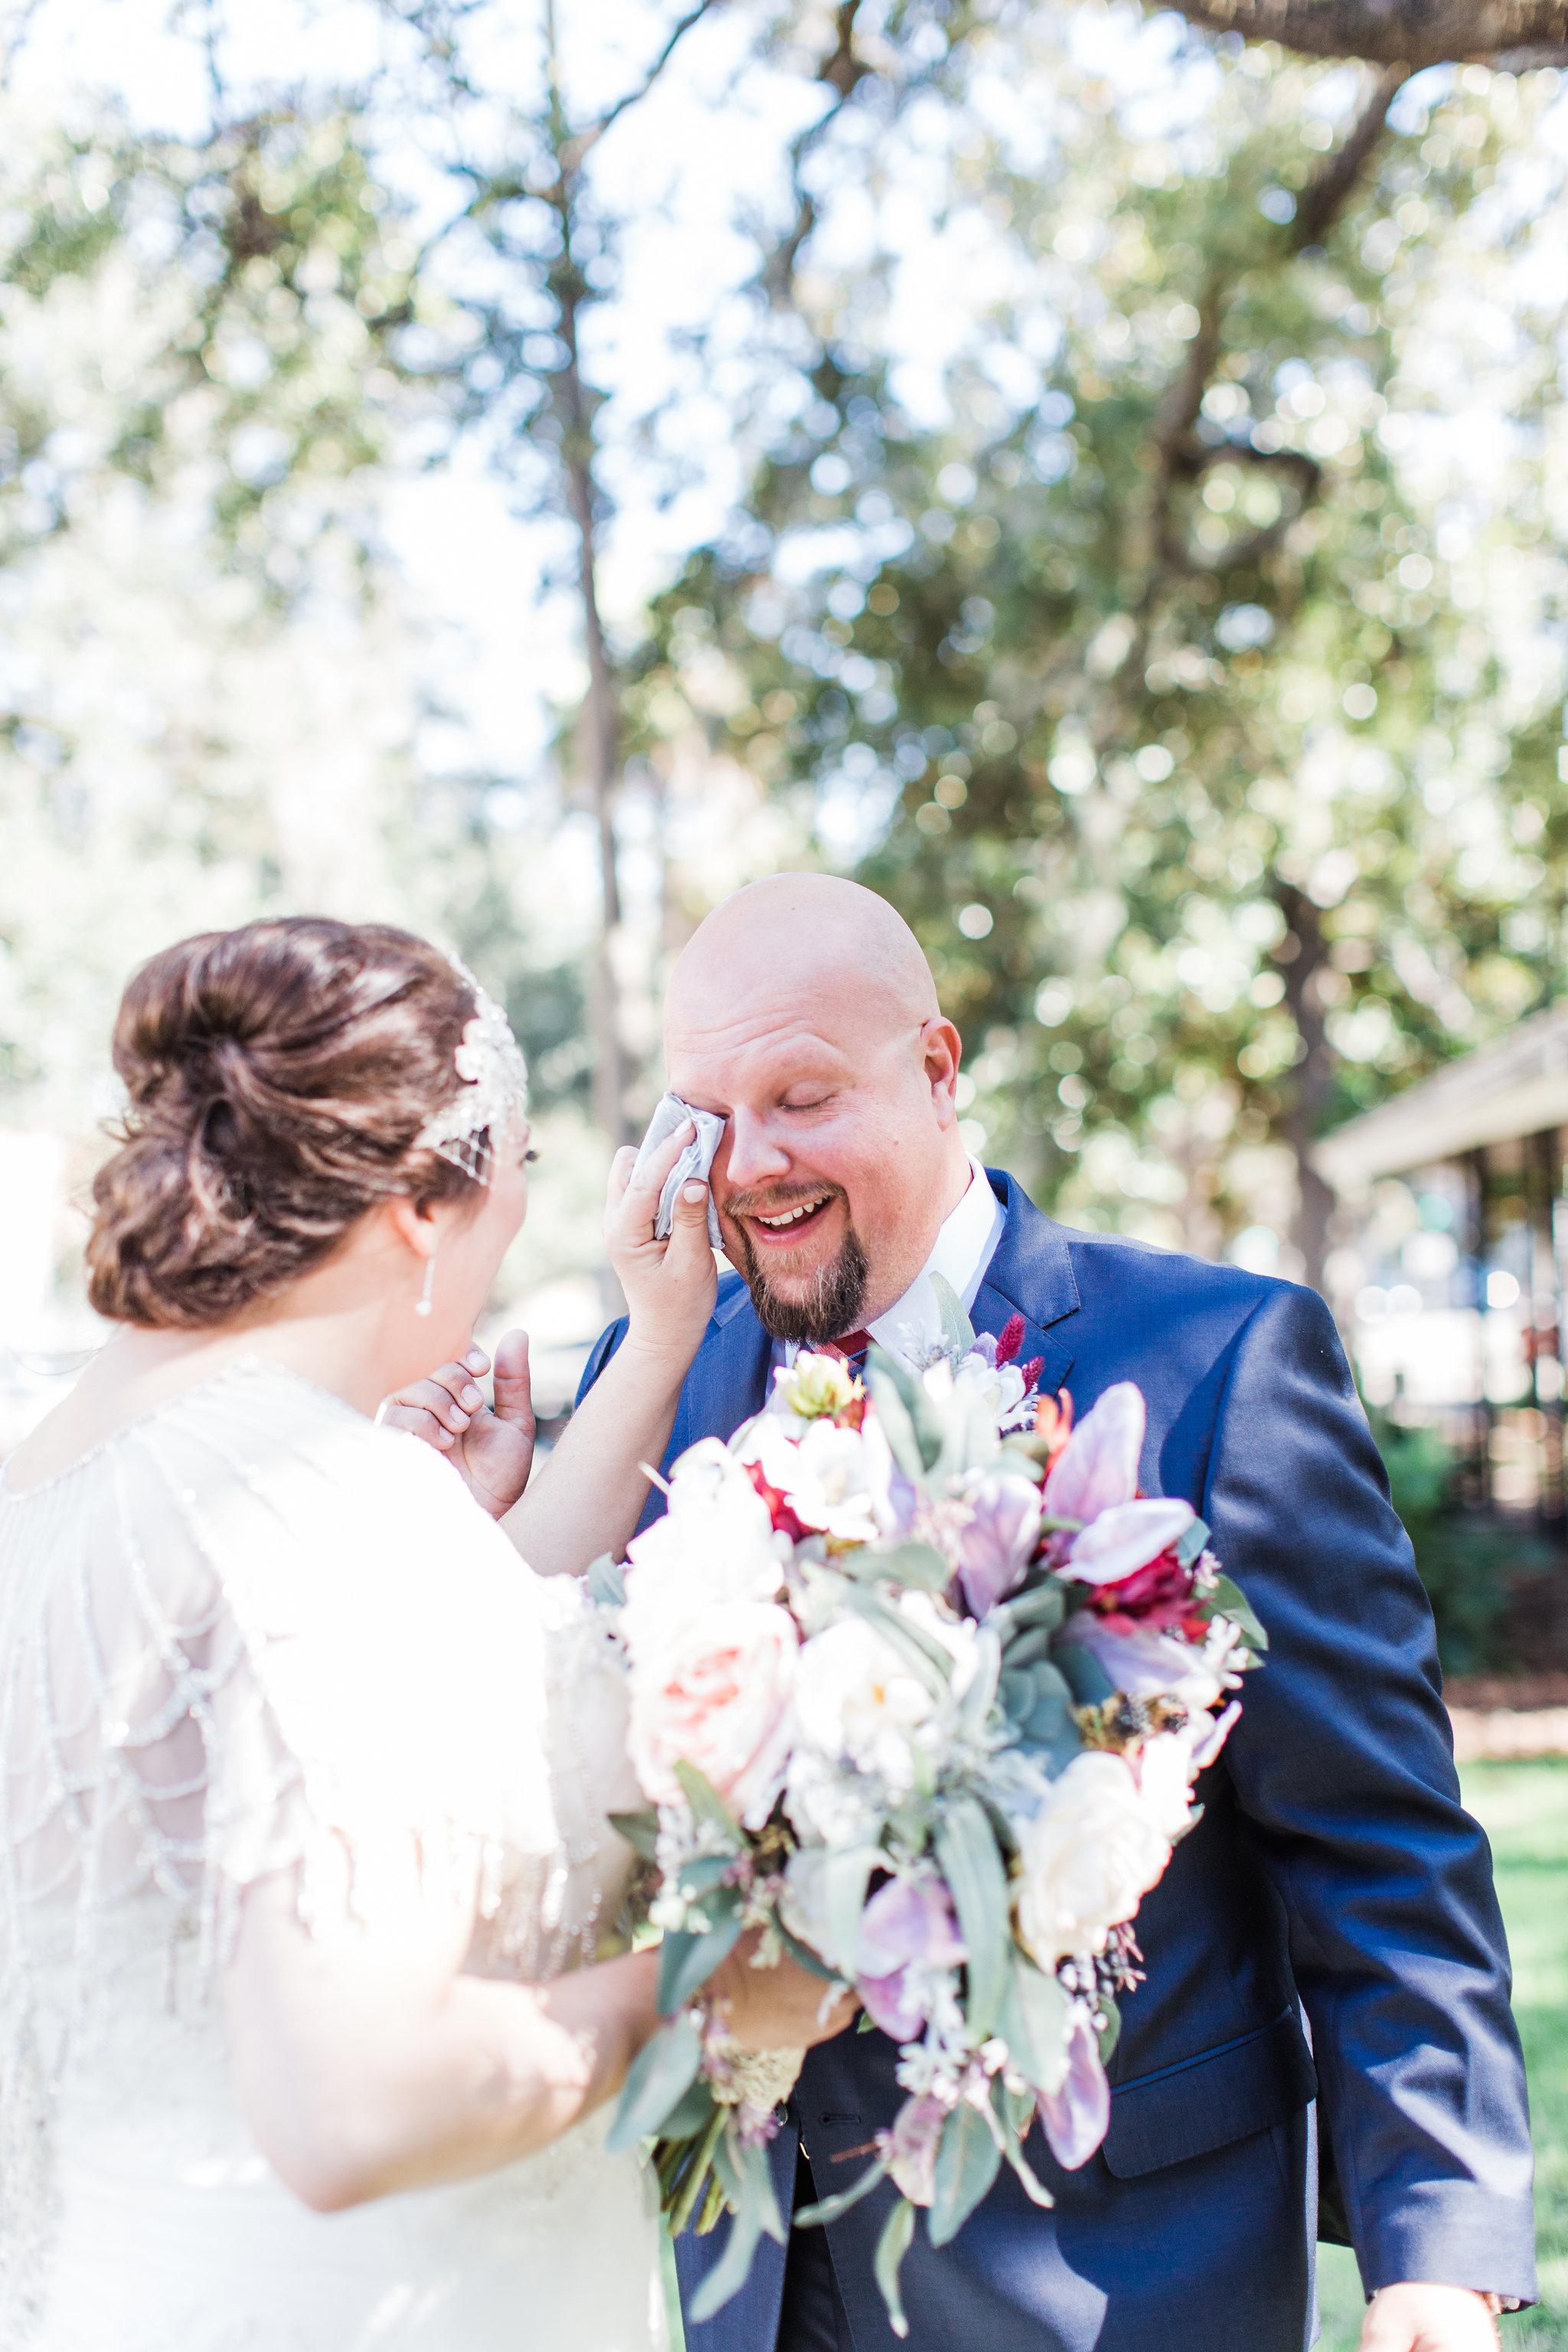 apt-b-photography-kristy-rob-wormsloe-elopment-savannah-wedding-photographer-savannah-elopement-wormsloe-wedding-historic-savannah-first-look-9.jpg